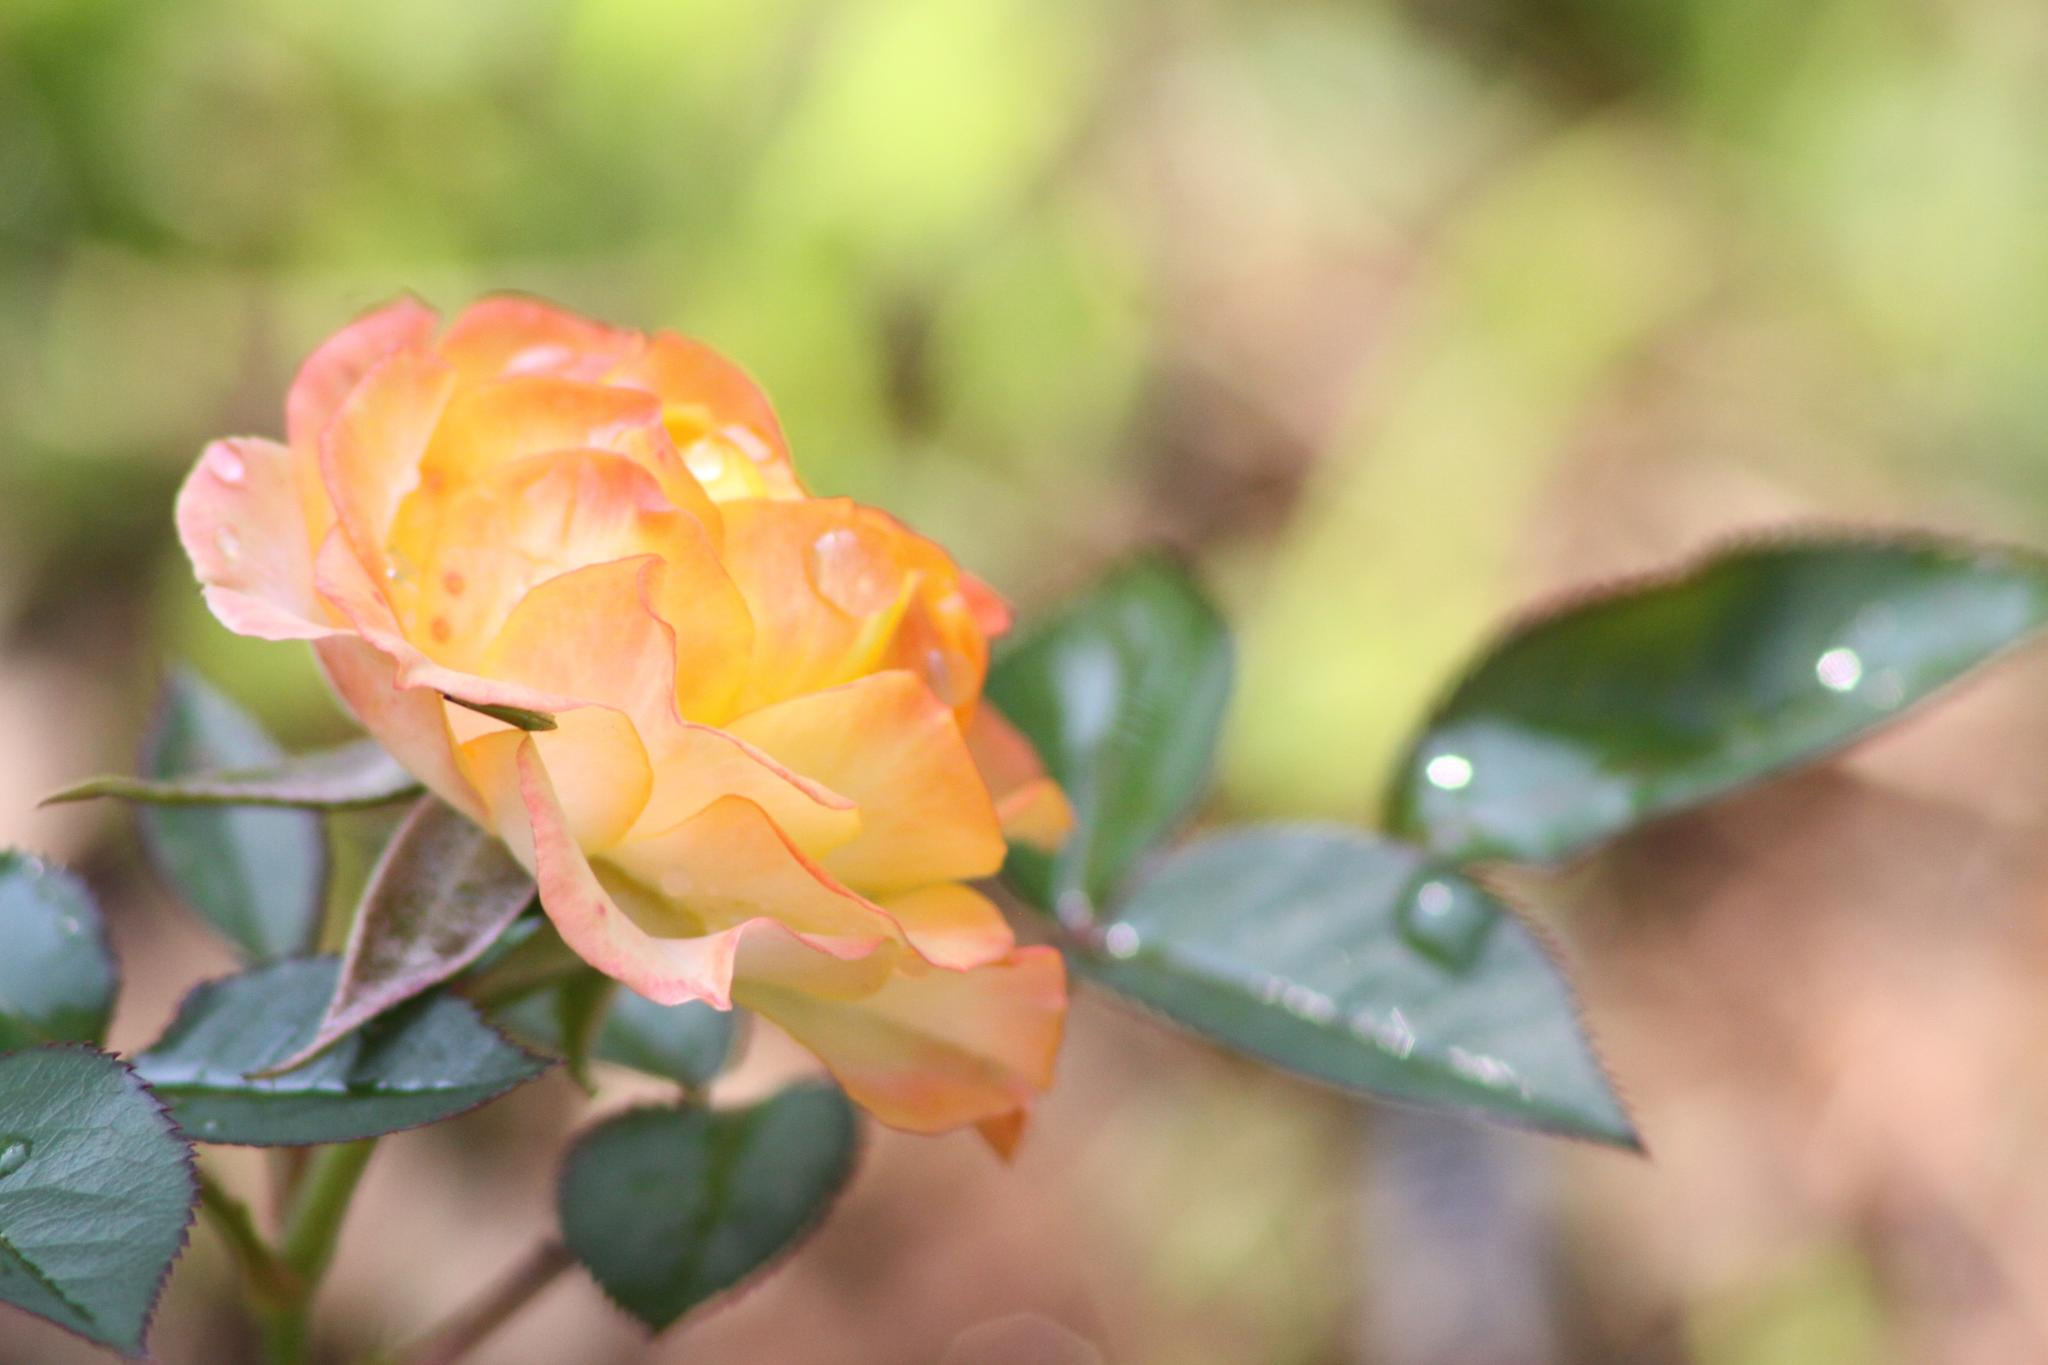 Early Morning Rose by lori.monroe.50